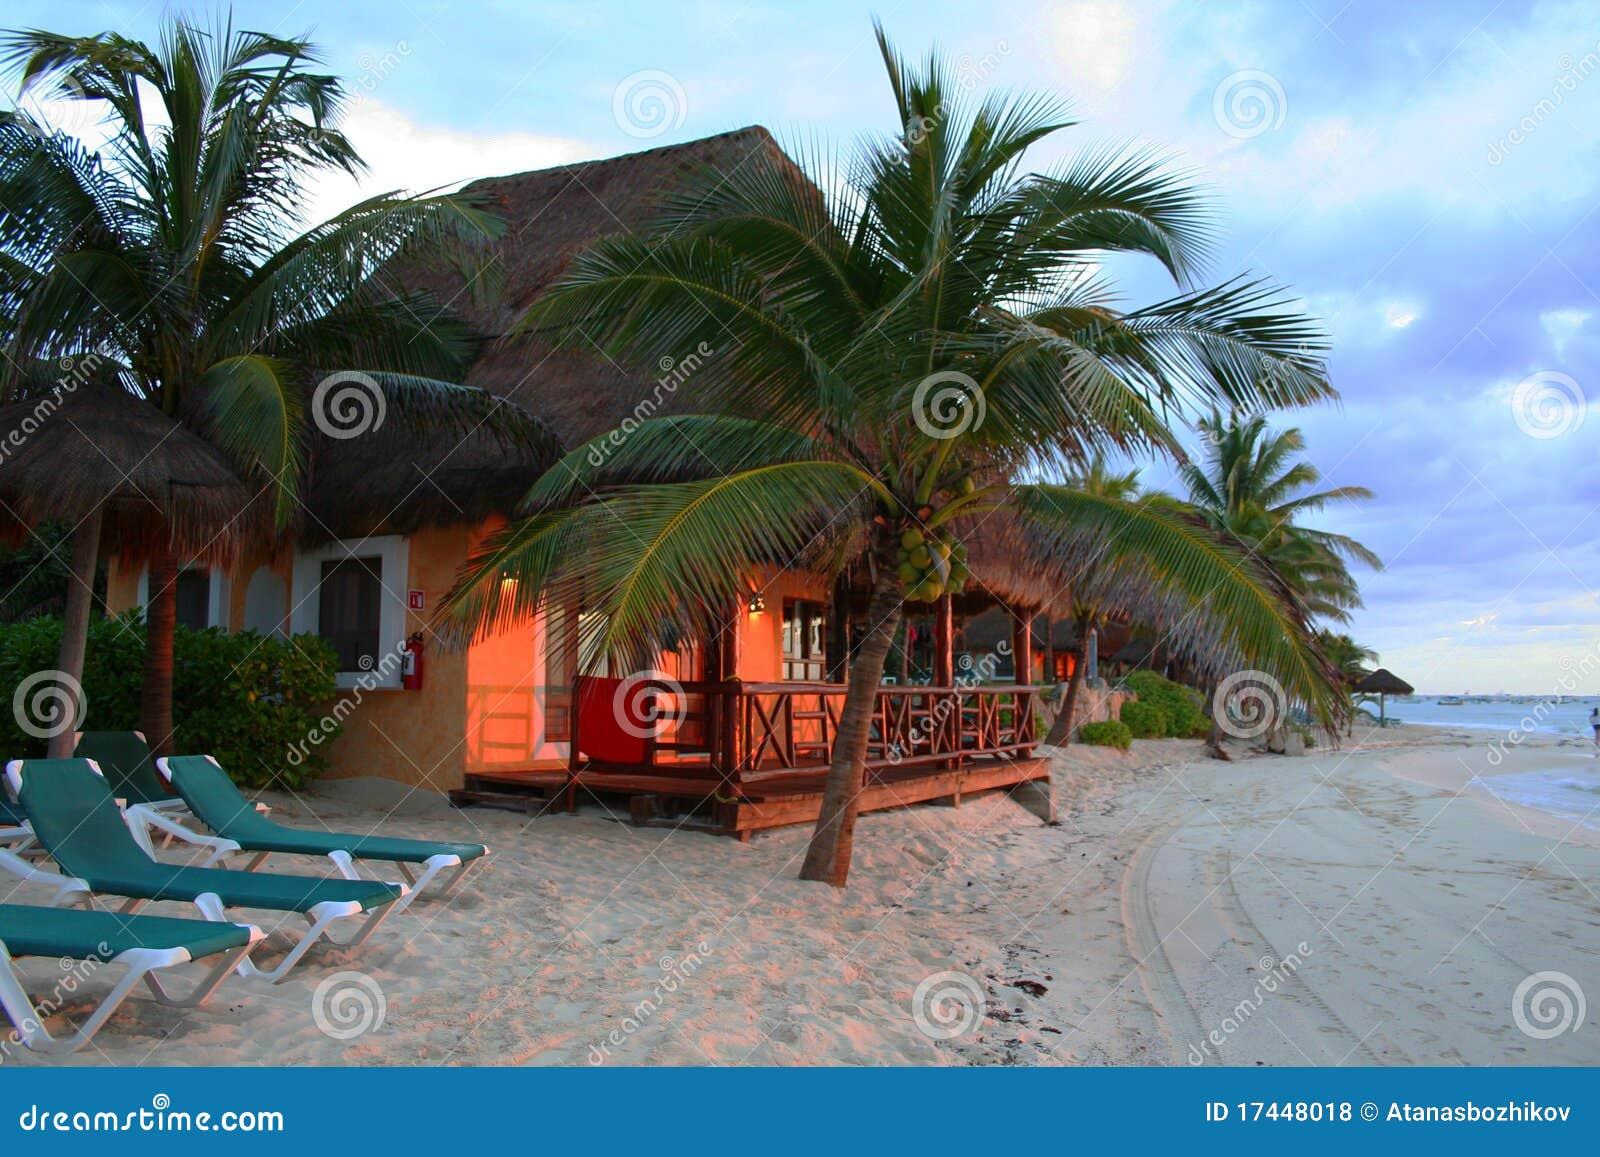 Sunset At Resort In Playa Del Carmen Mexico Stock Photo